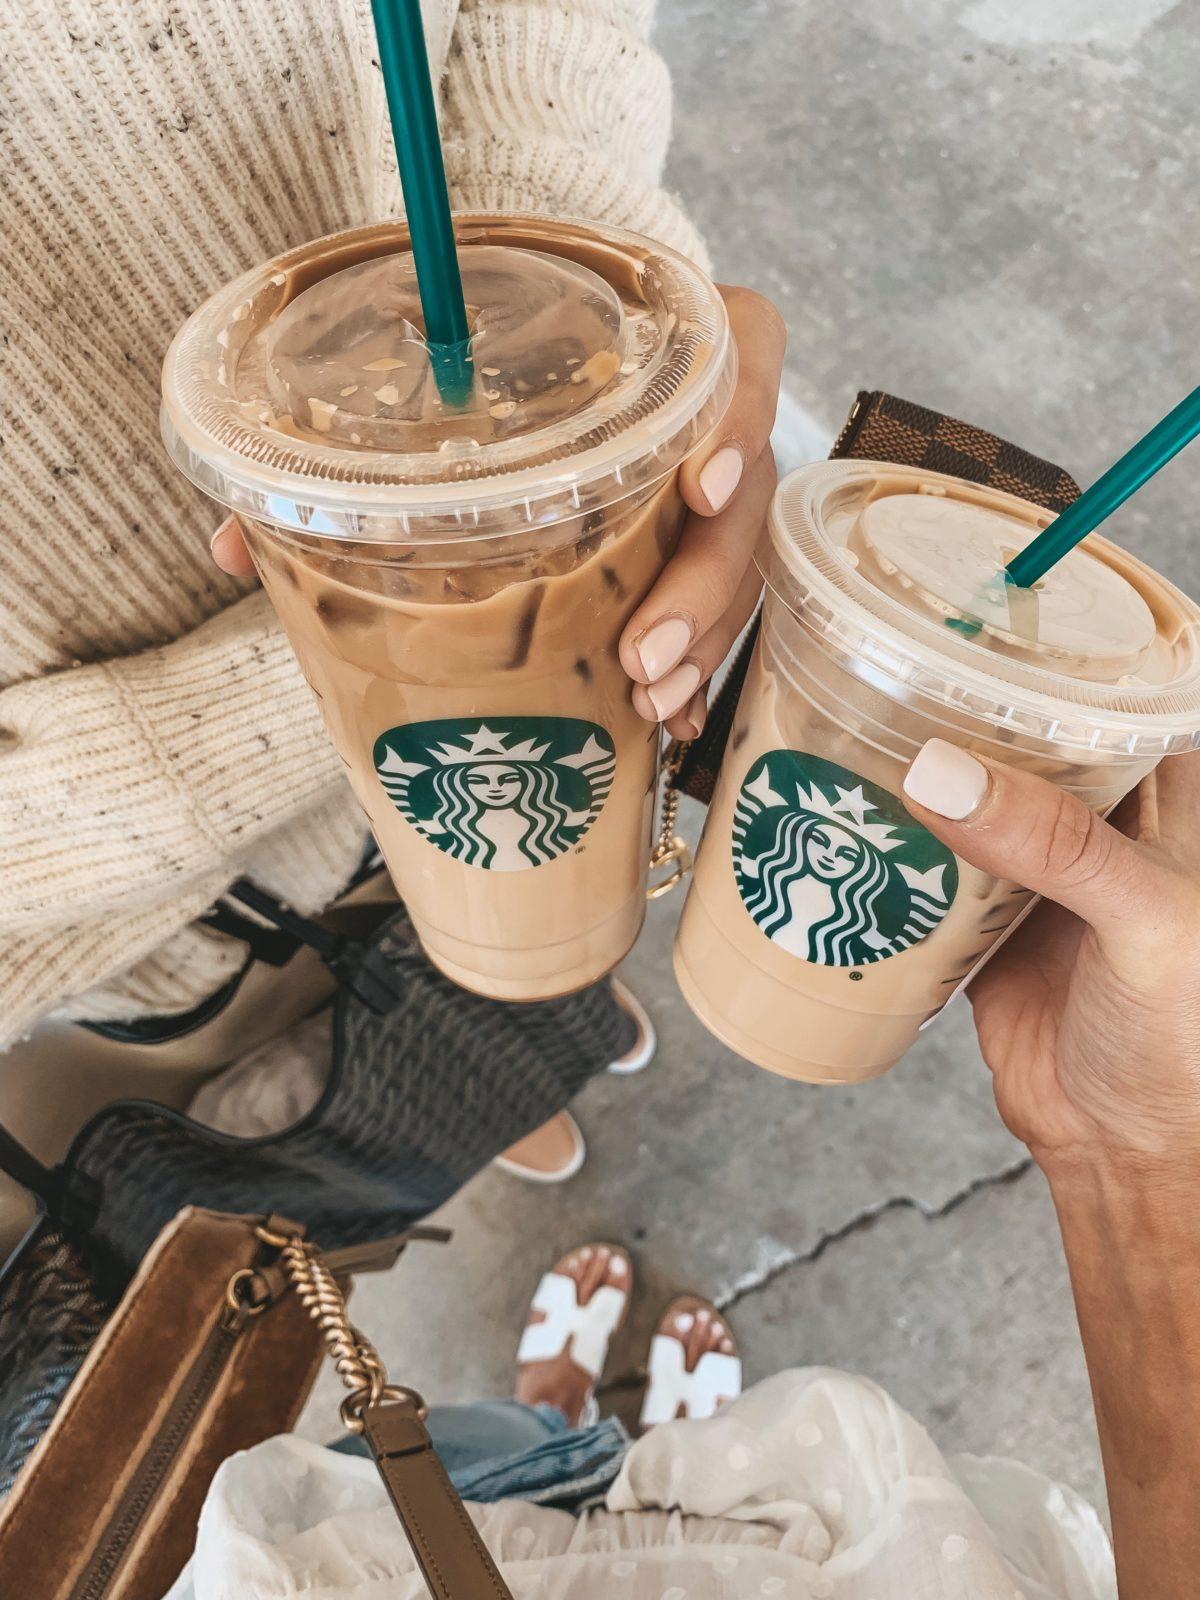 My Favorite Healthy Ways to Get Your StarbucksFix